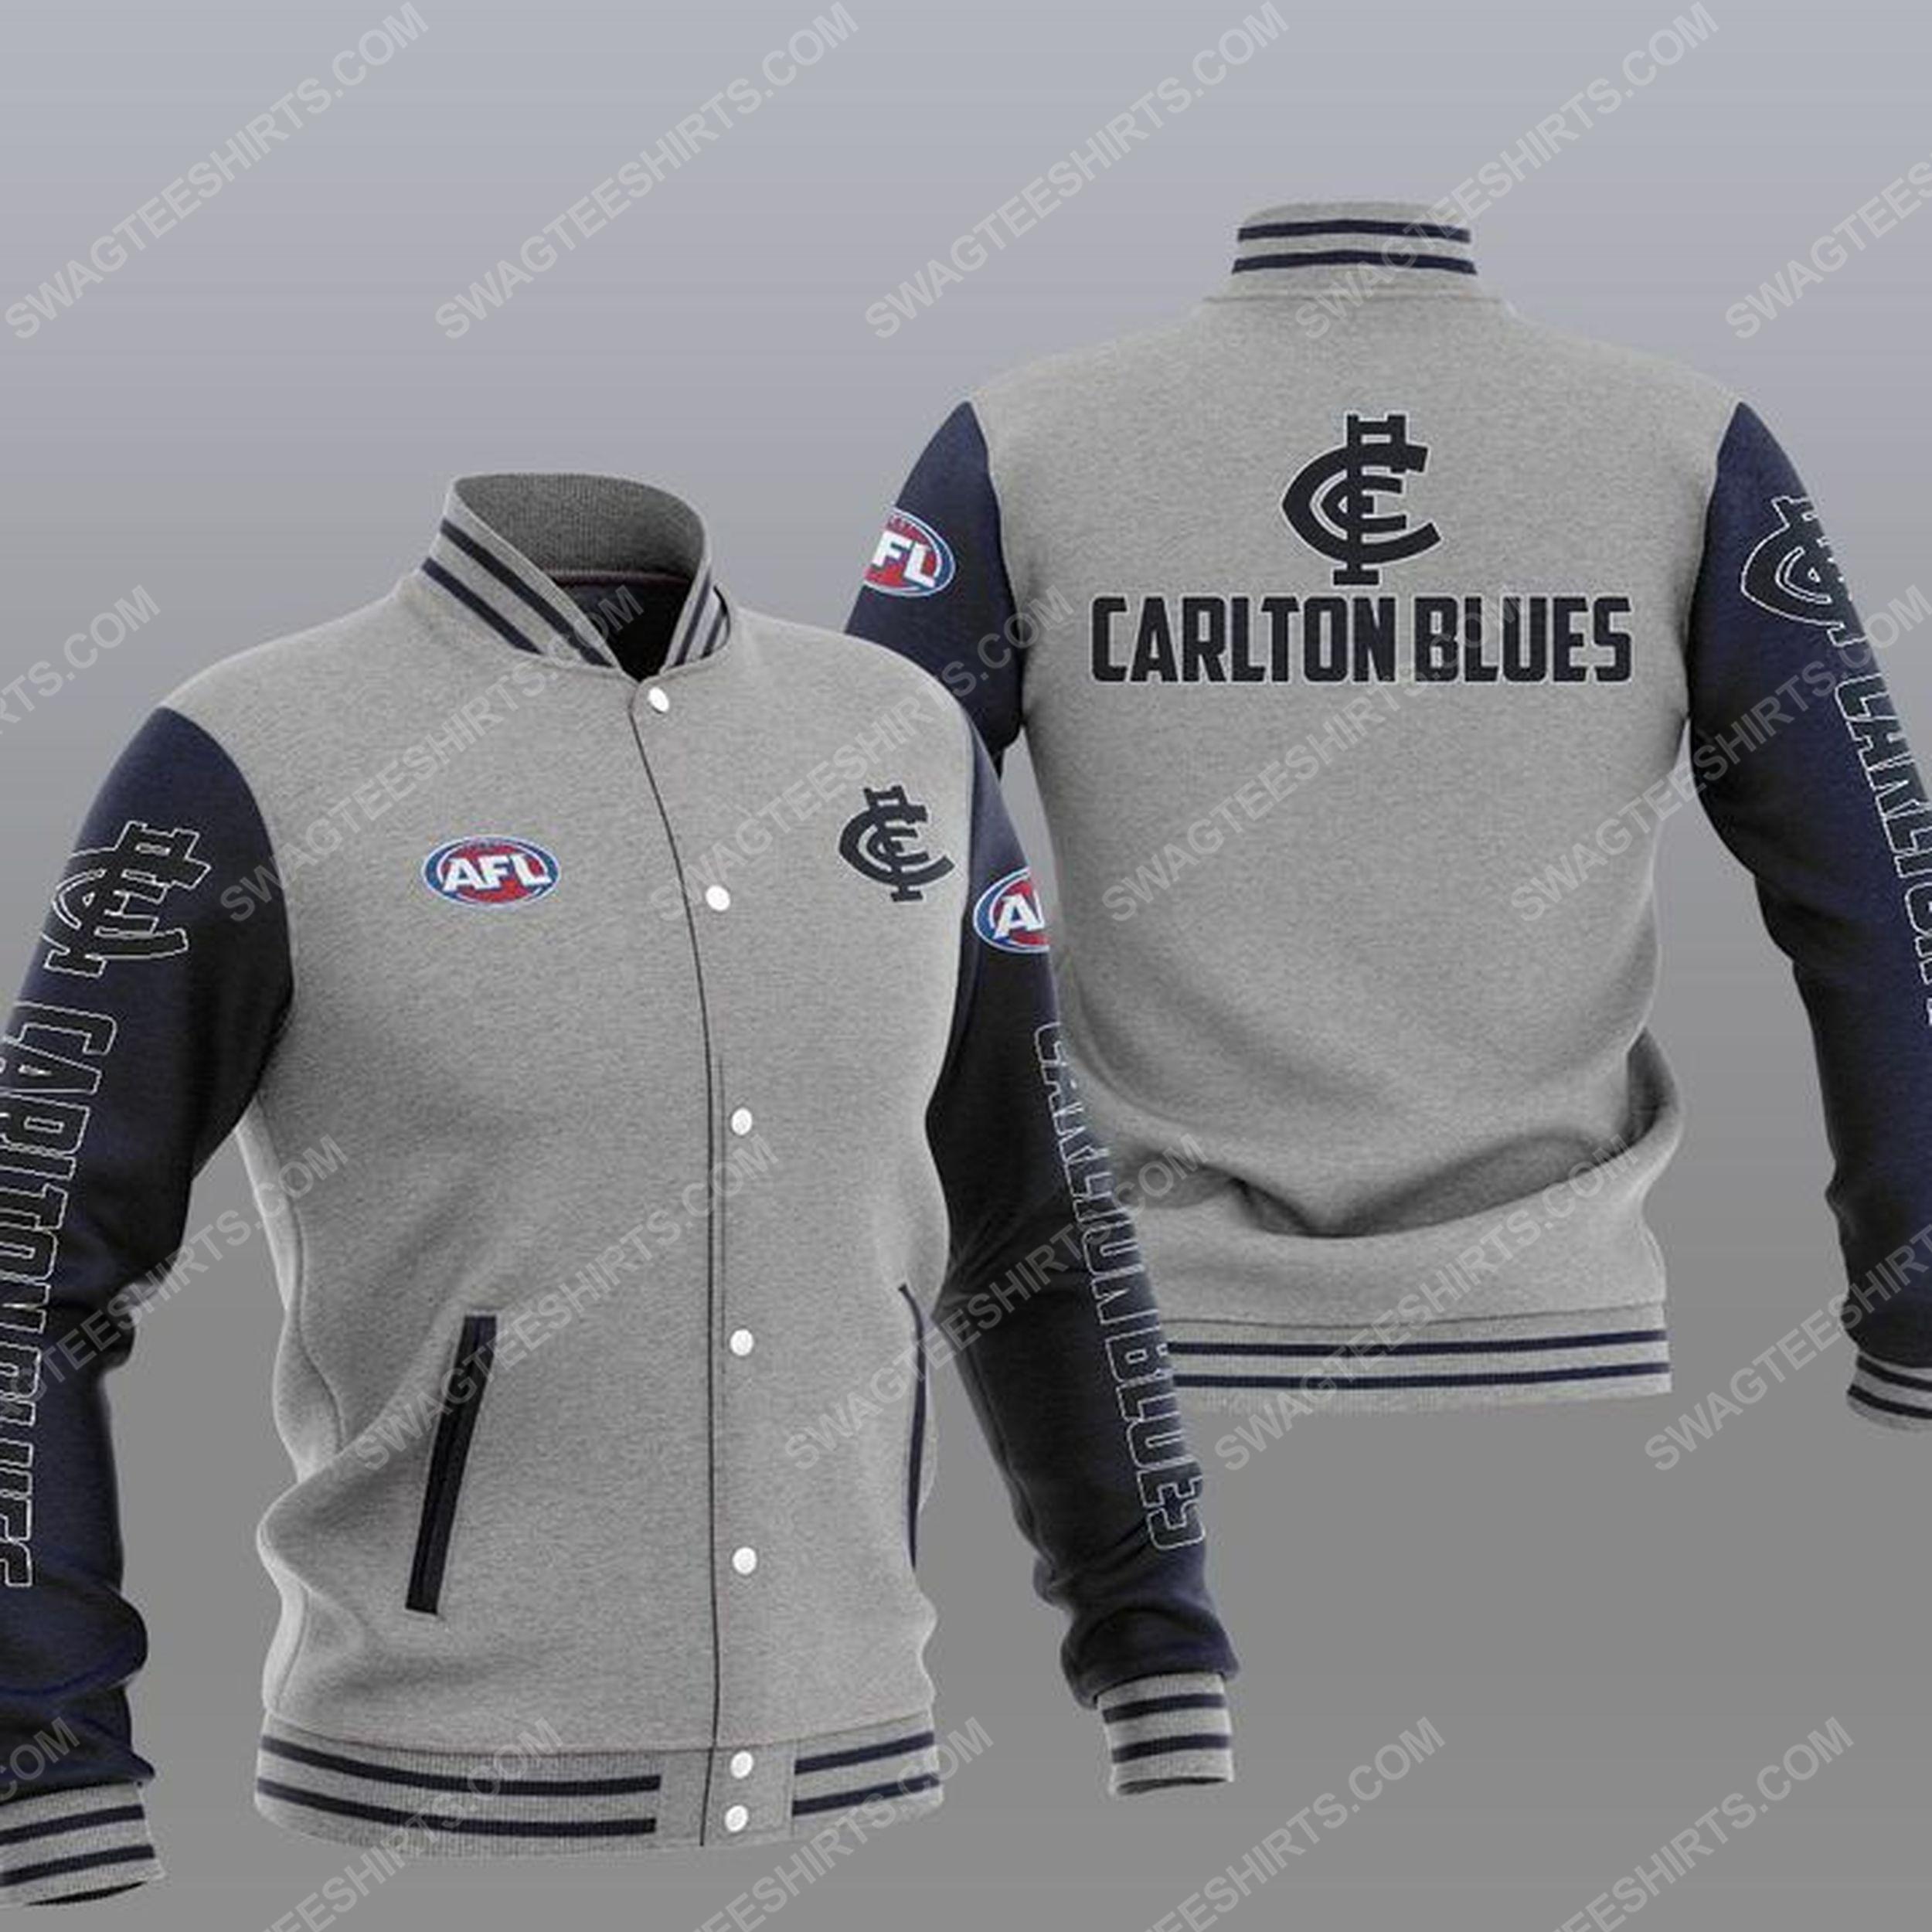 The carlton football club all over print baseball jacket - gray 1